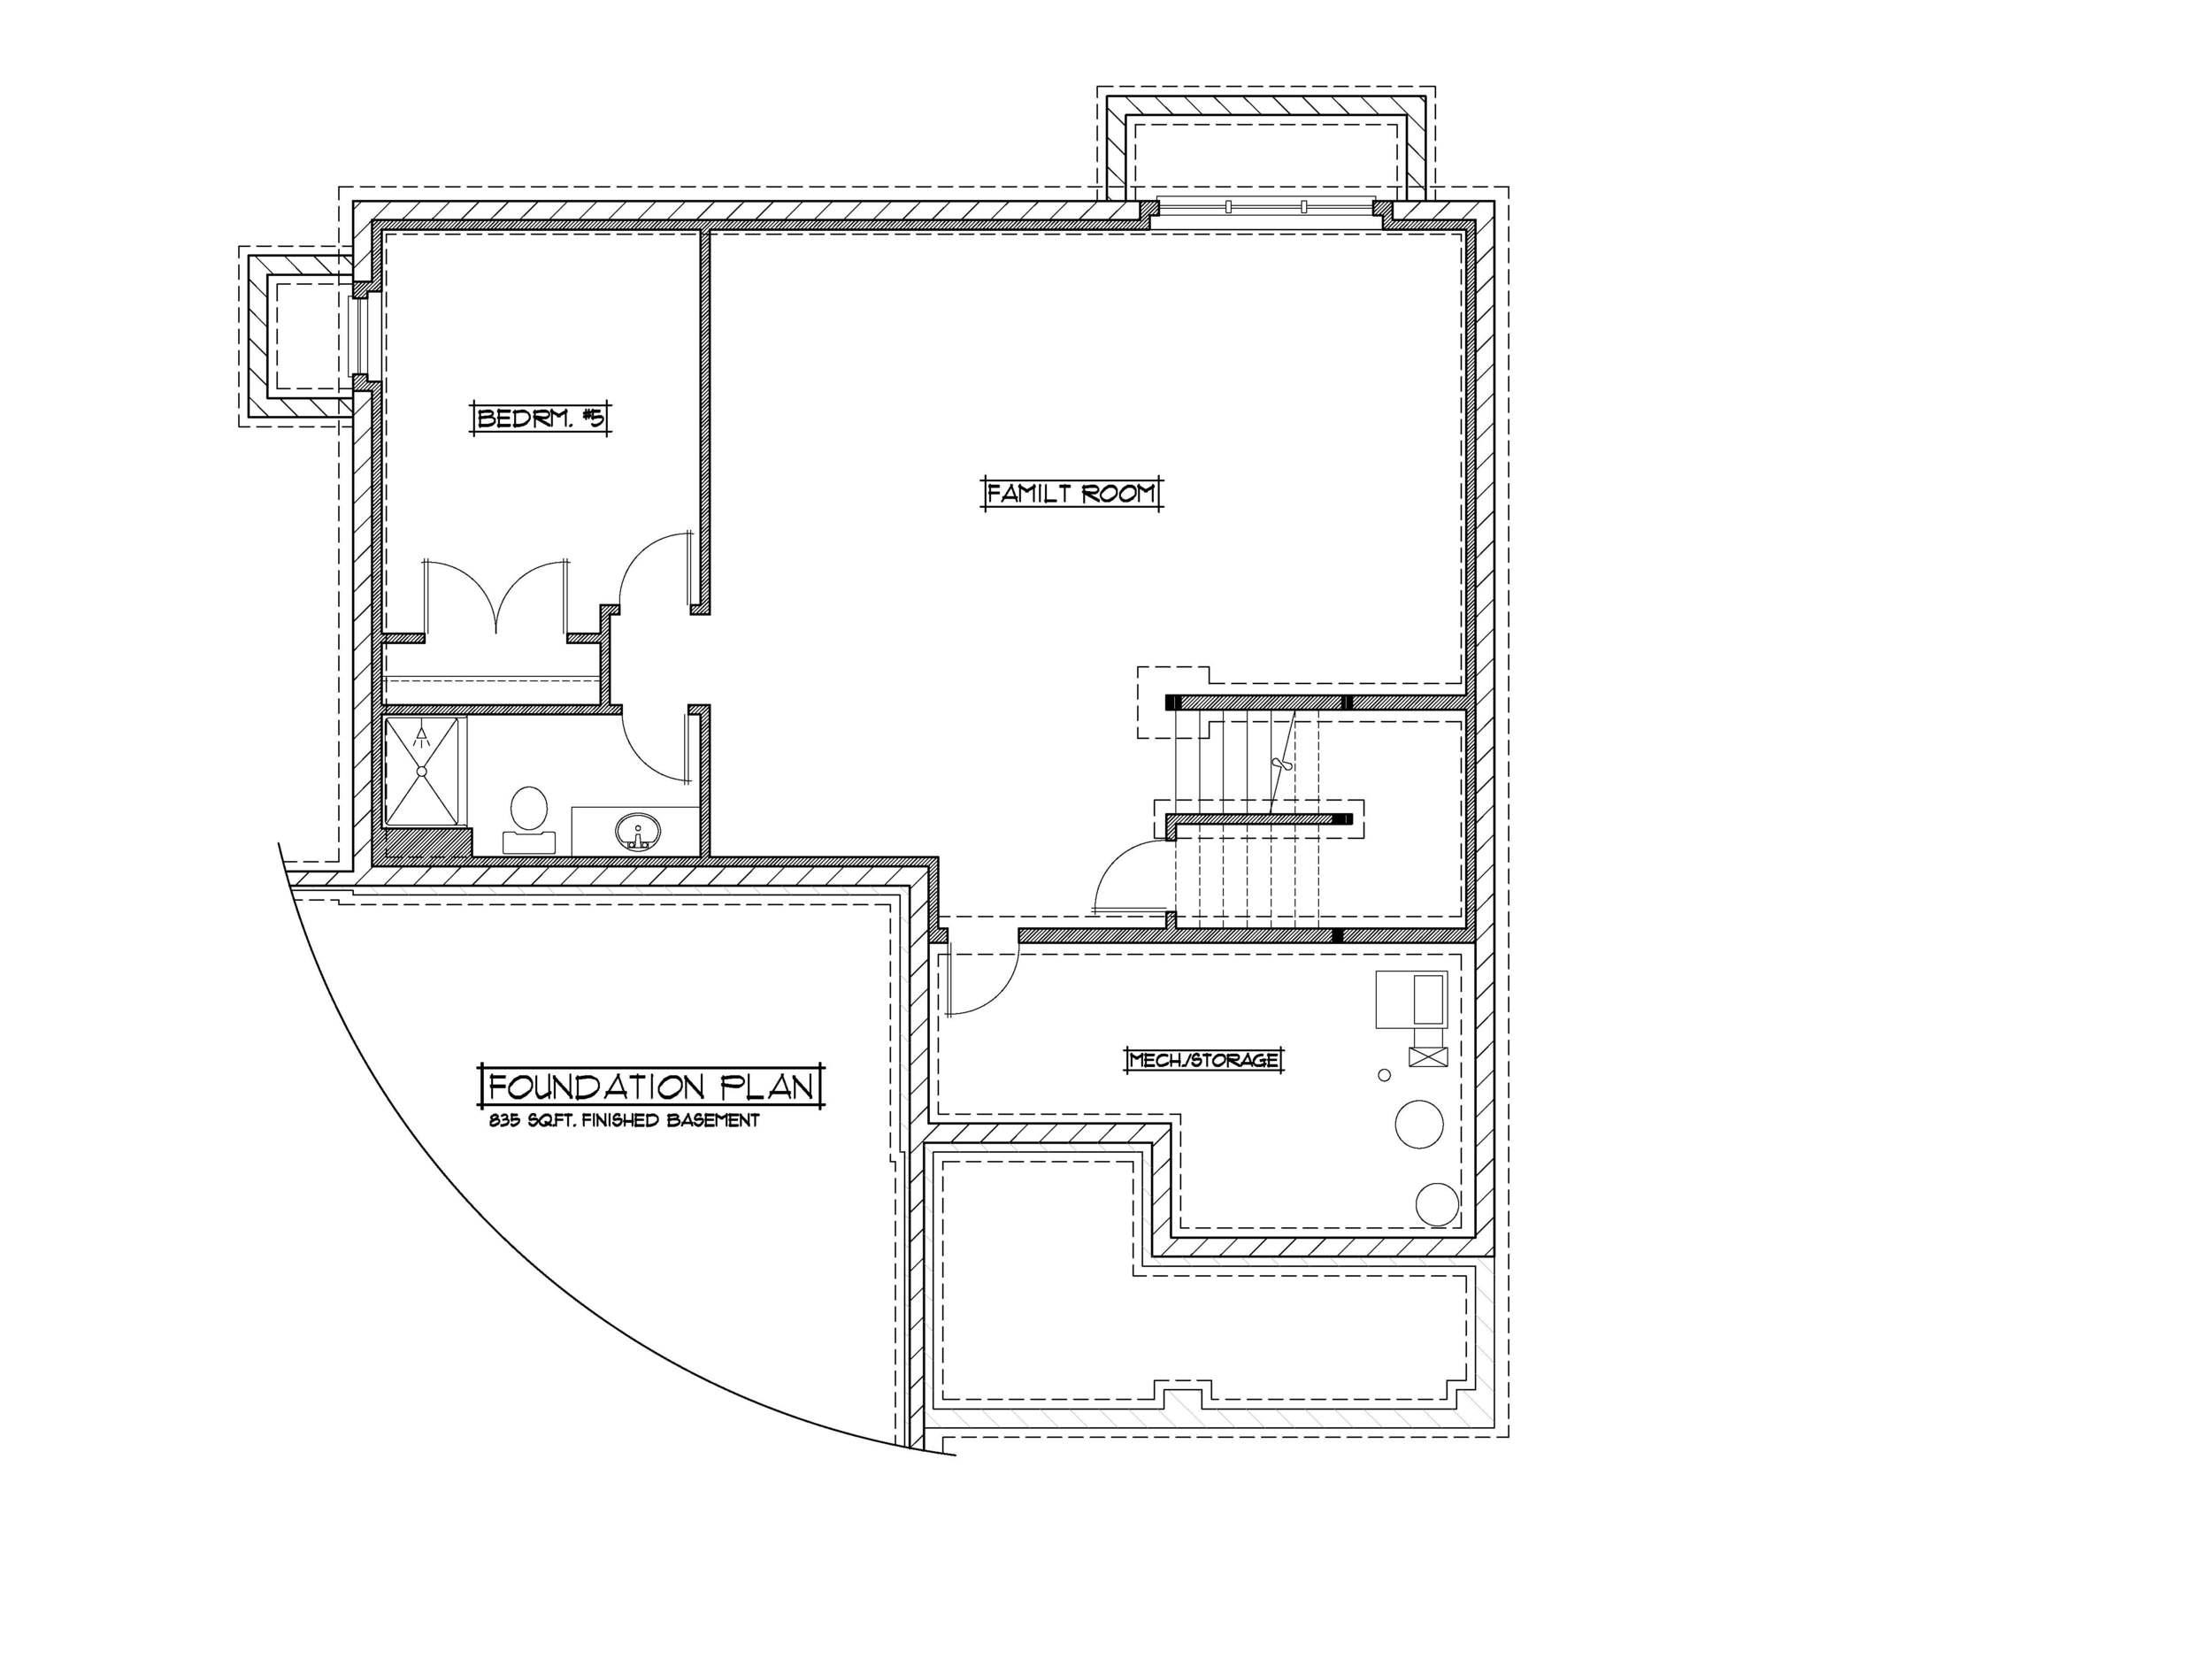 Foundation Plan.jpg